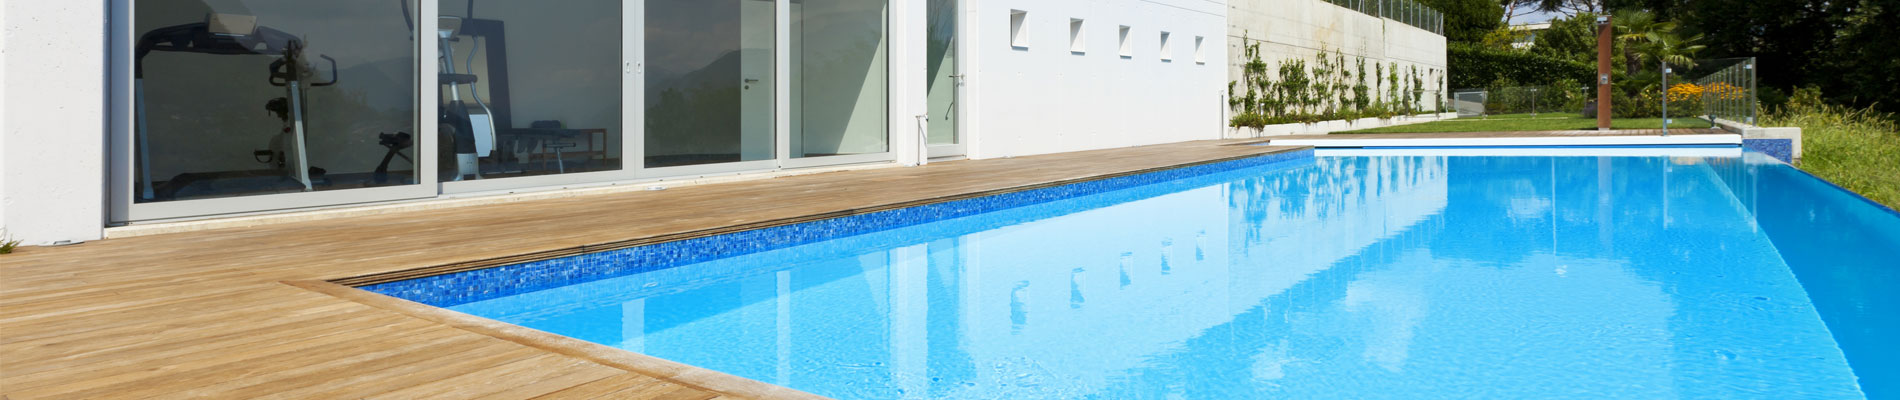 Shop schwimmbad sauna dampfbad pool selber bauen for Schwimmbad shop